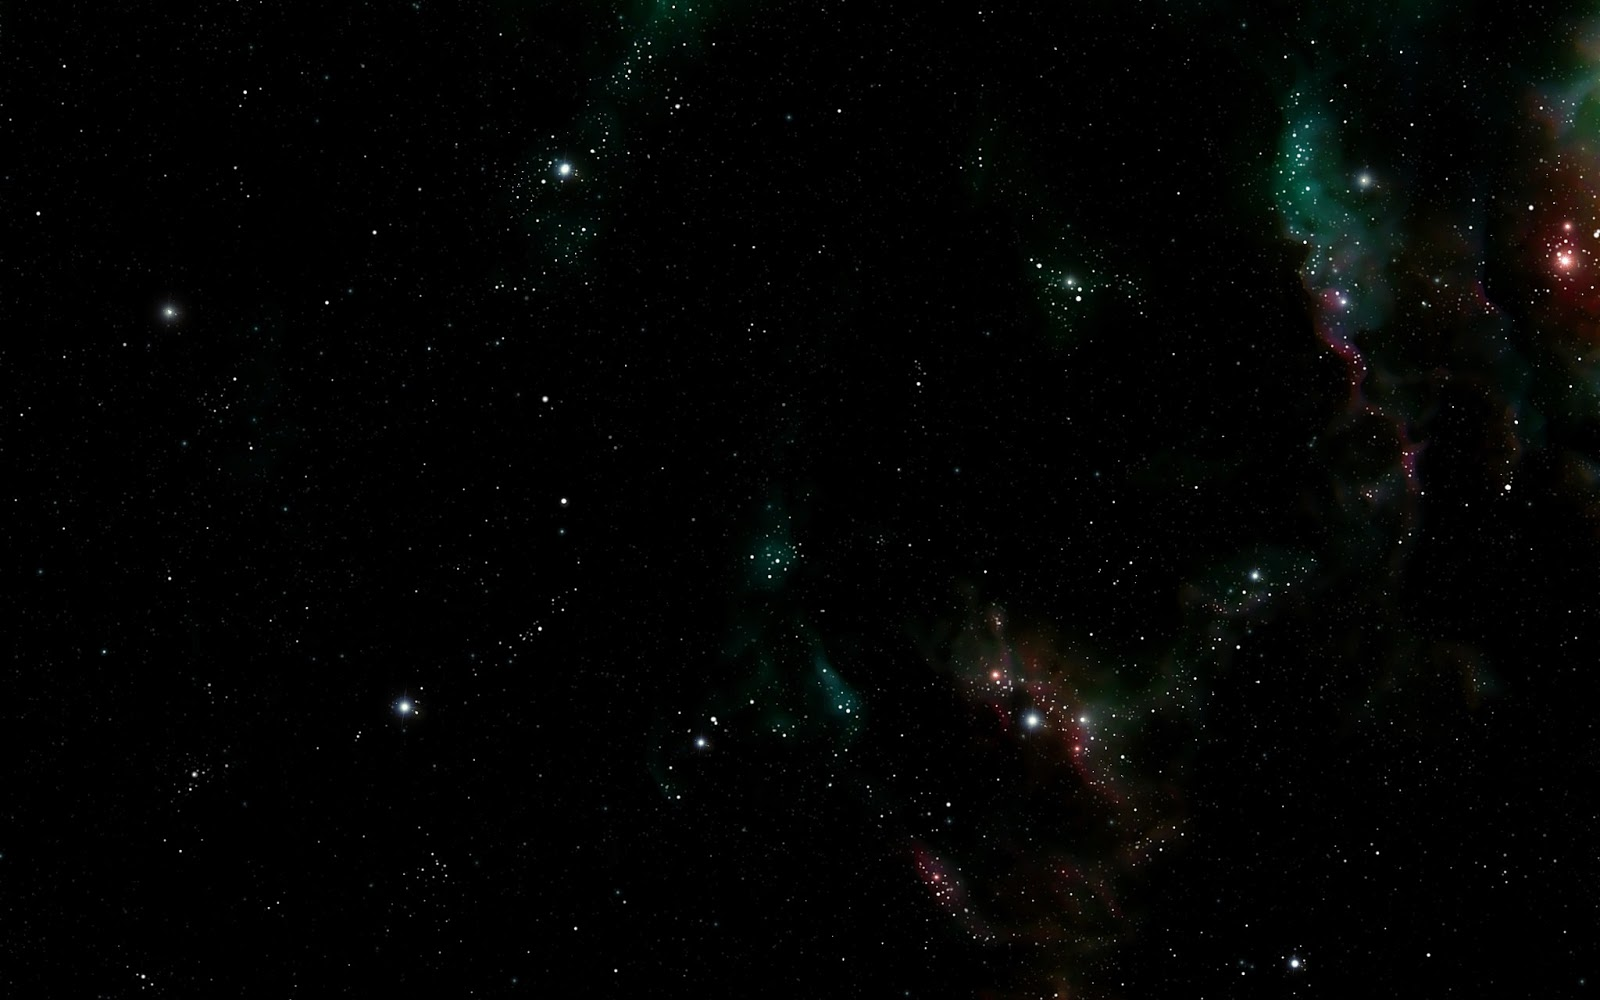 Beyond Earthly Skies: The Universe's Last Stars